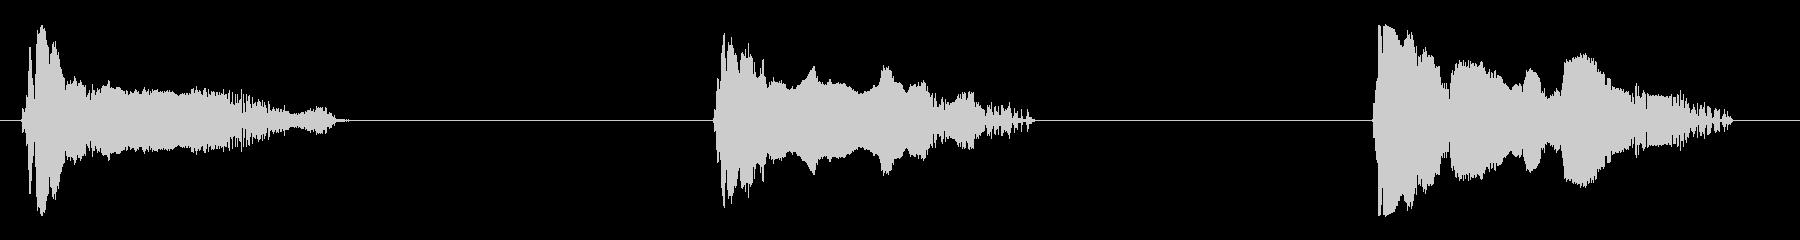 Red Tailed Hawk:シ...の未再生の波形